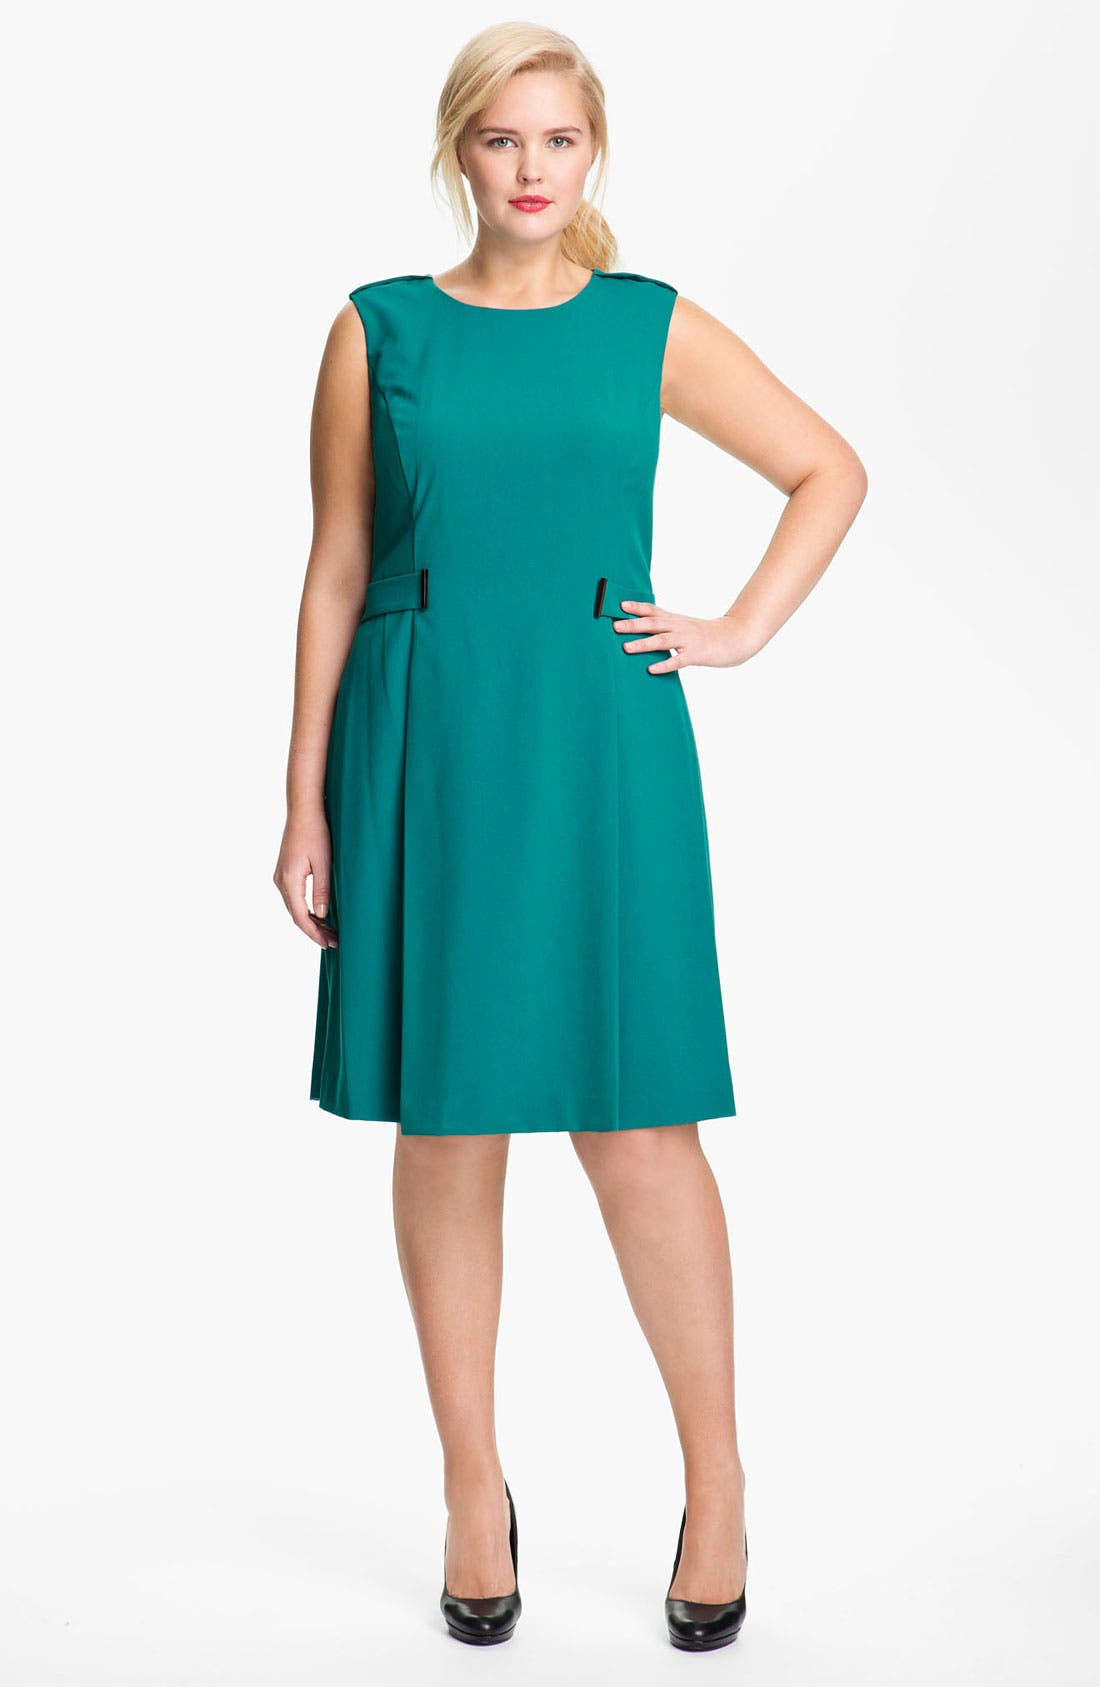 Alternate Image 1 Selected - Calvin Klein Side Tab Sleeveless Dress (Plus)